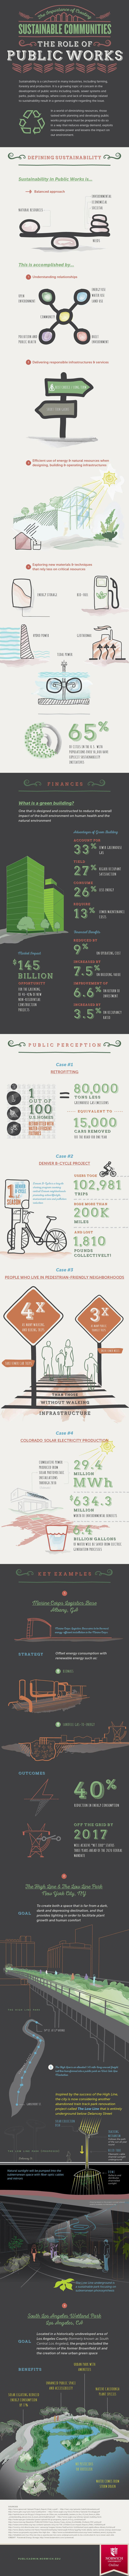 Infographic - Sustainable communities